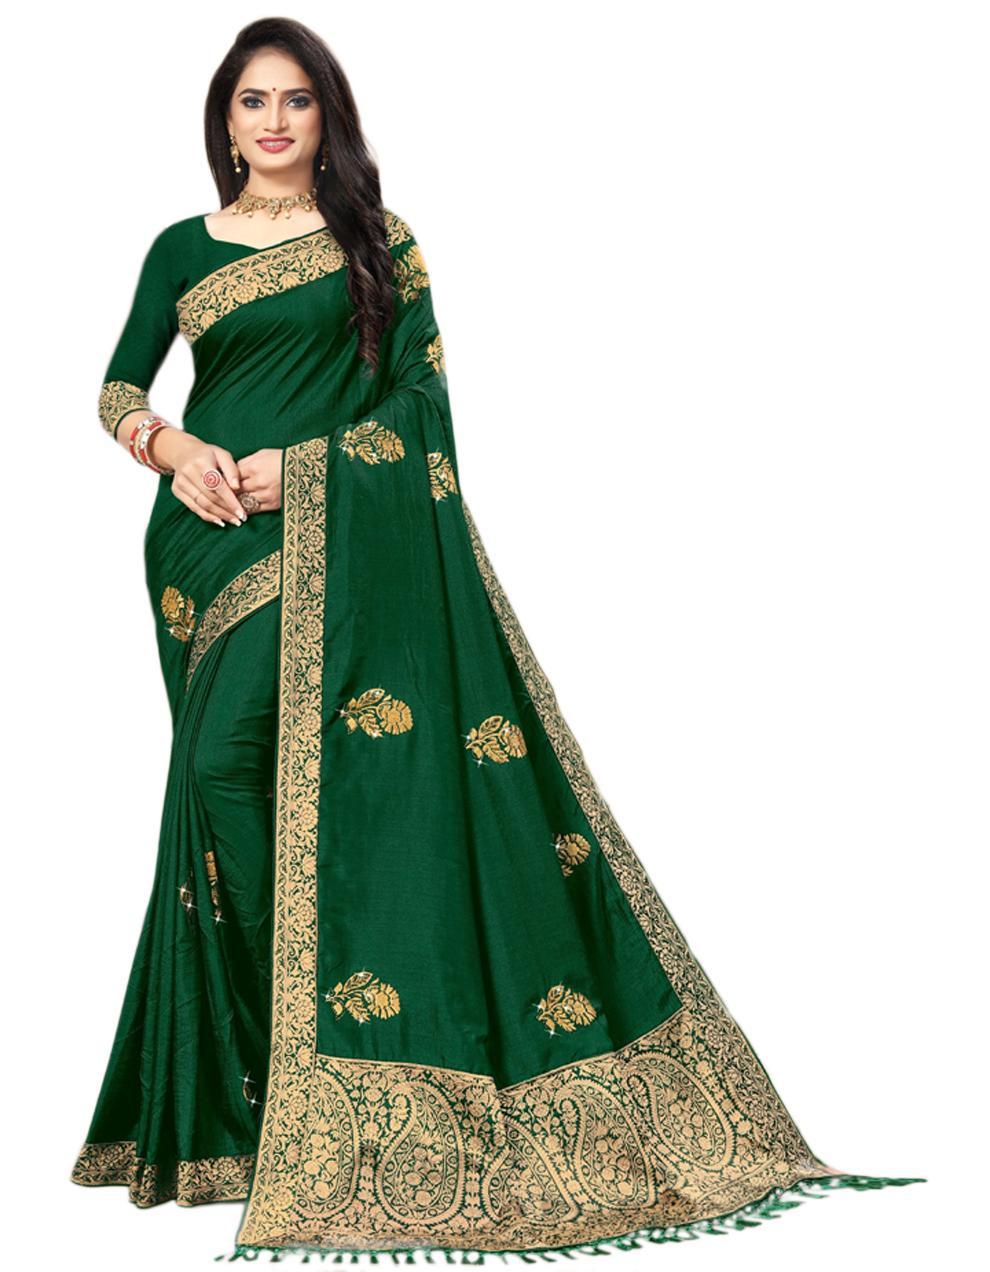 Green Vichitra silk Saree With Blouse IW24348